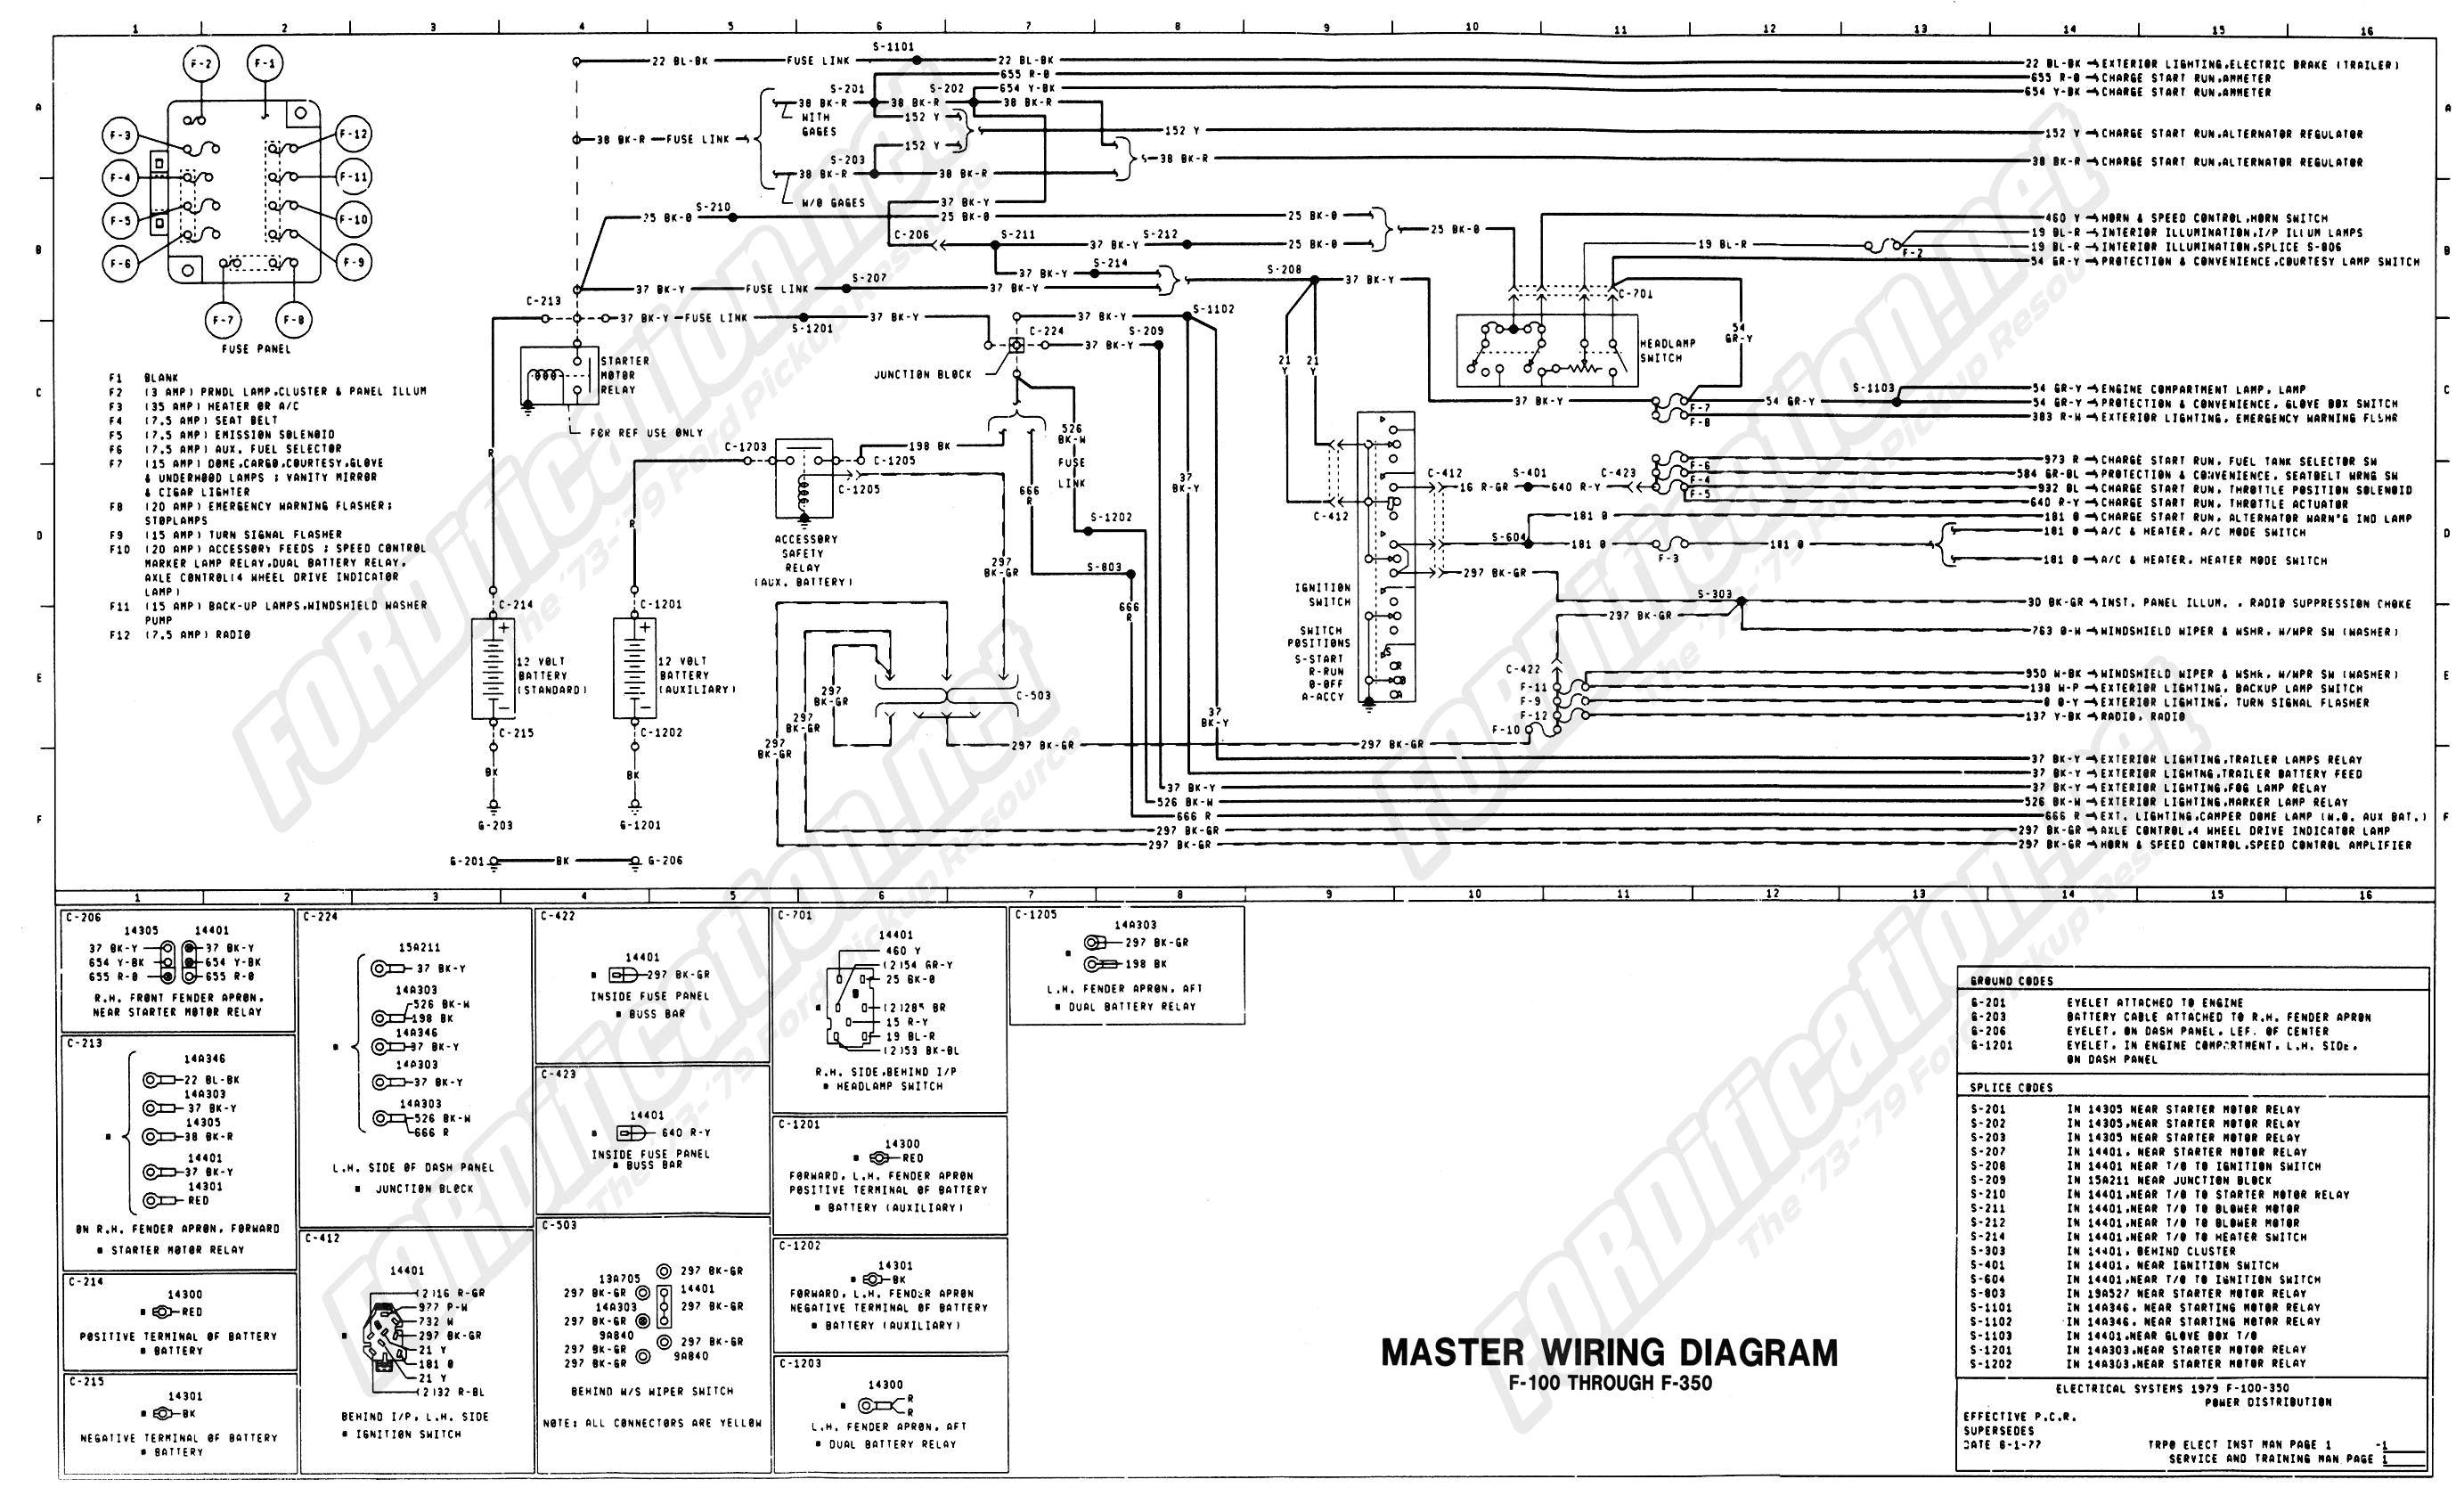 [ZTBE_9966]  Sterling Ignition Switch Wiring Diagram - F6 wiring diagram | 2007 Sterling Trucks Wiring Diagrams |  | telephonie-dentreprise-var.fr